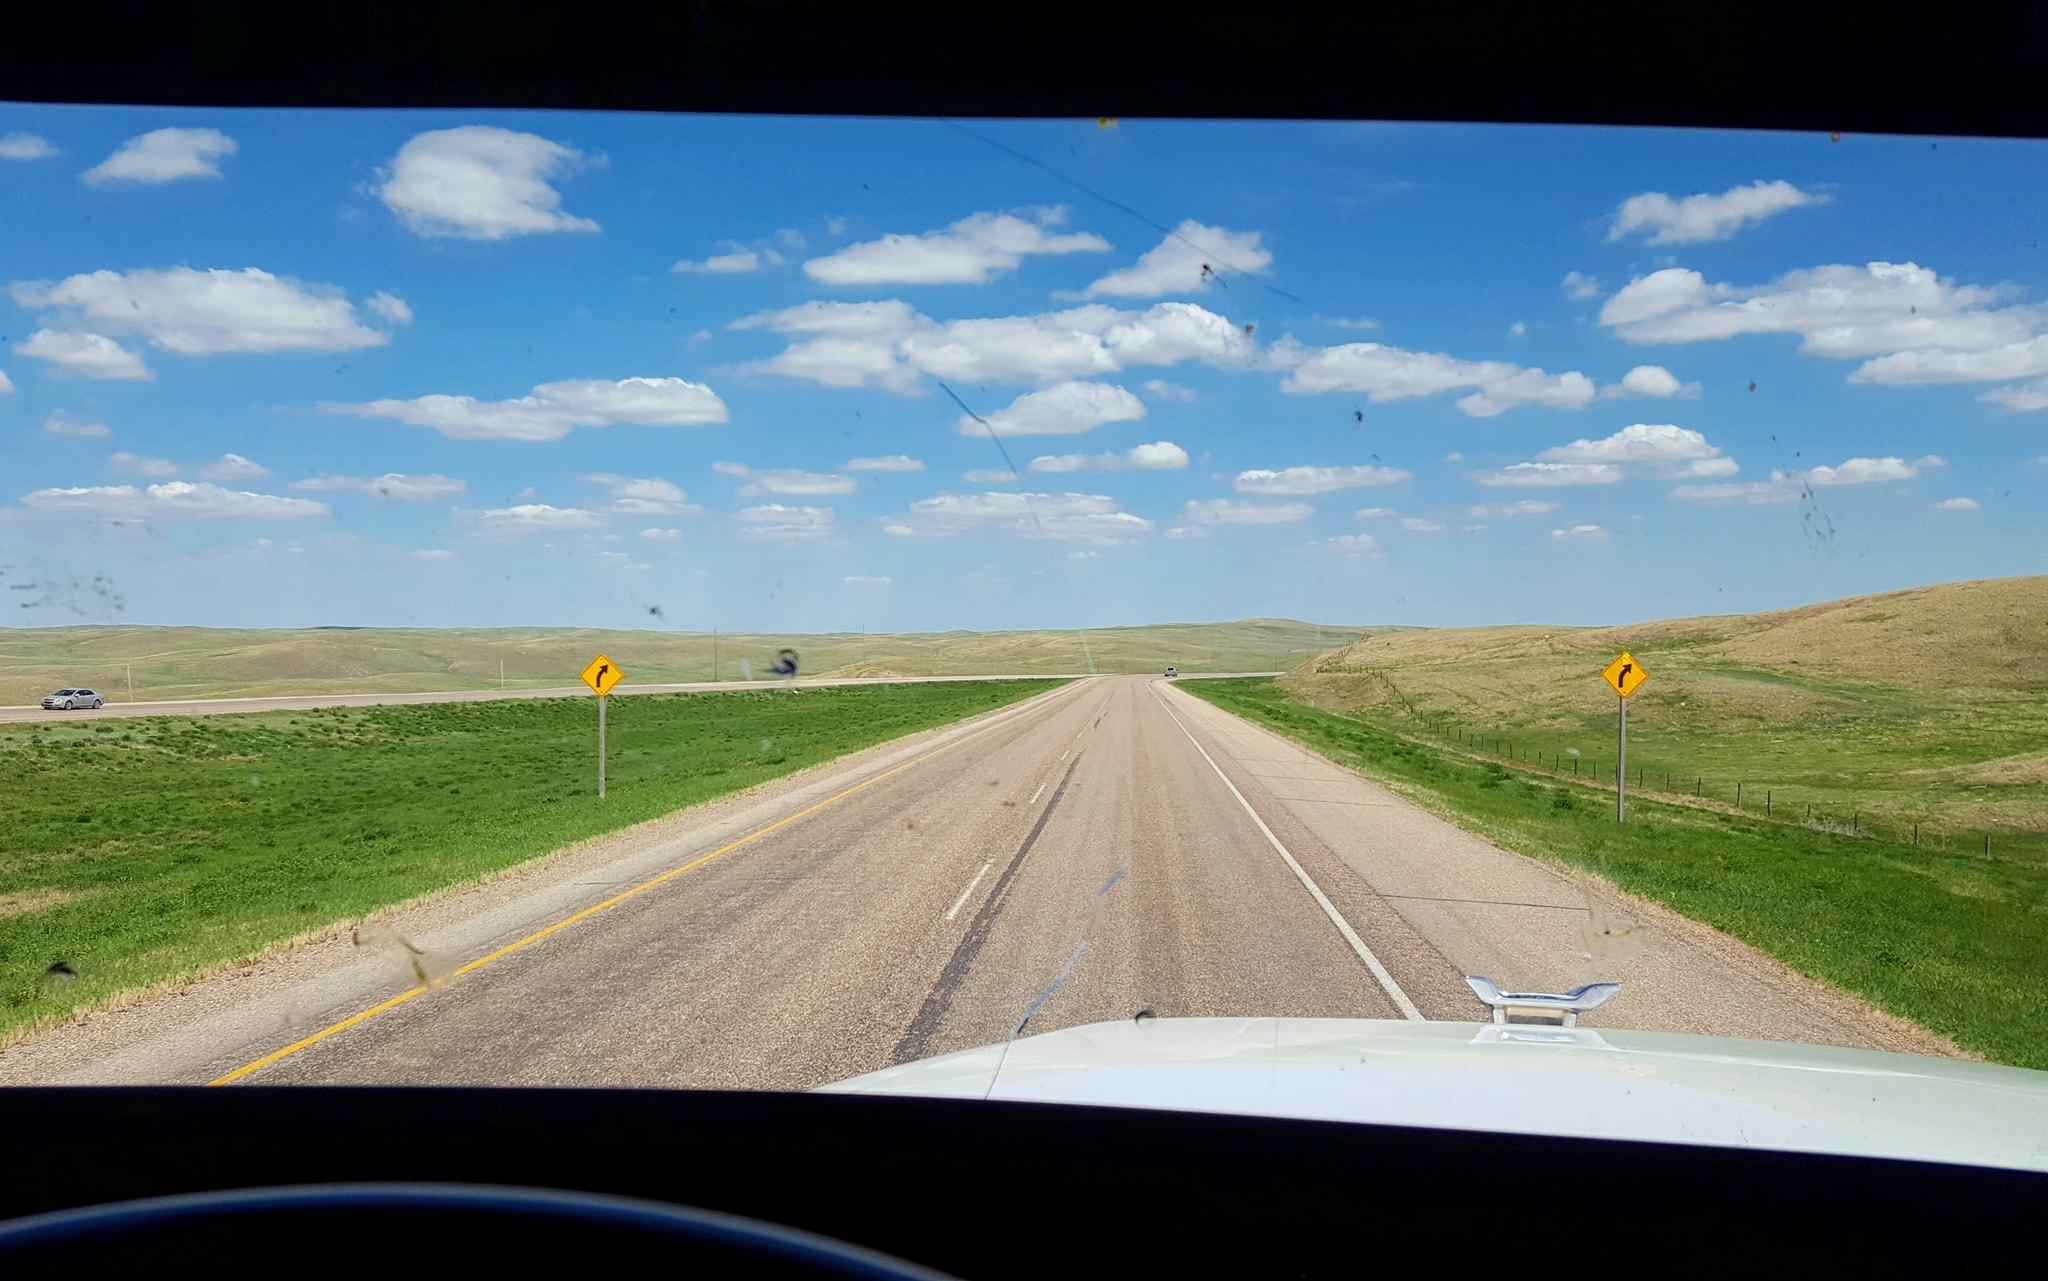 28-5-2018-samen-op-weg-naar-Manitoba-(2)